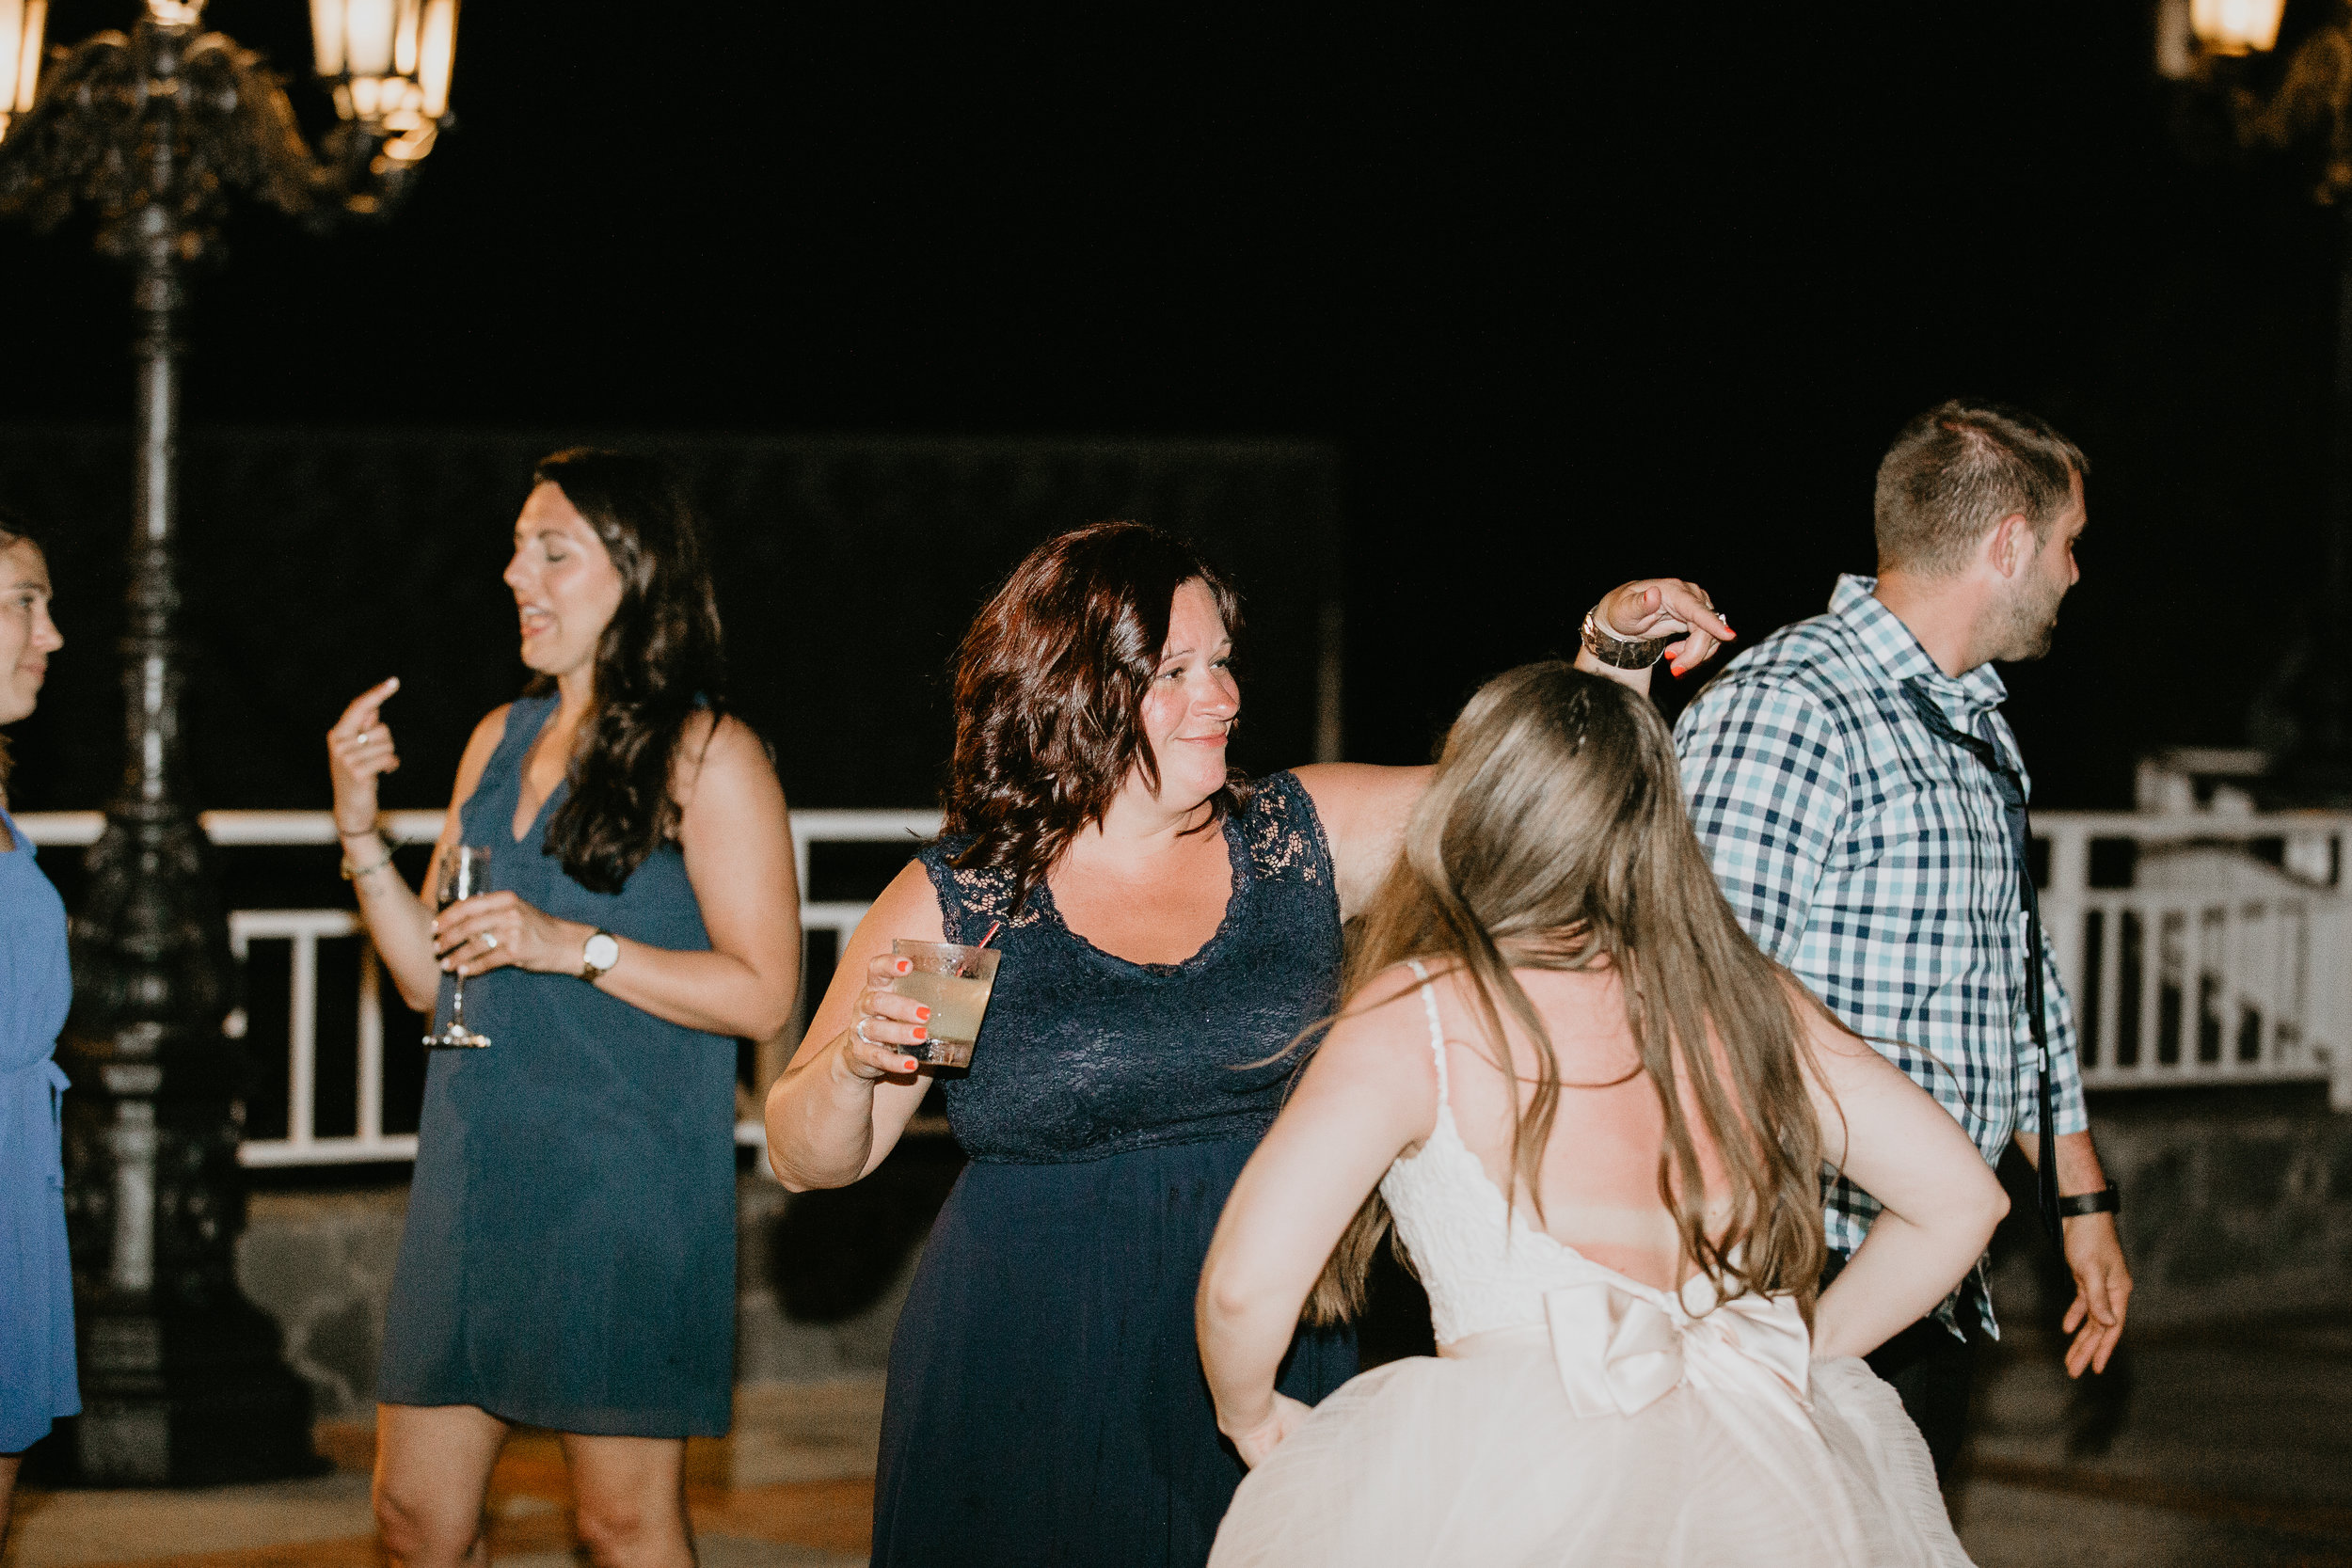 nicole-daacke-photography-destination-wedding-in-st-lucia-sandals-la-toc-intimate-island-wedding-carribean-elopement-photographer-chill-island-wedding-158.jpg